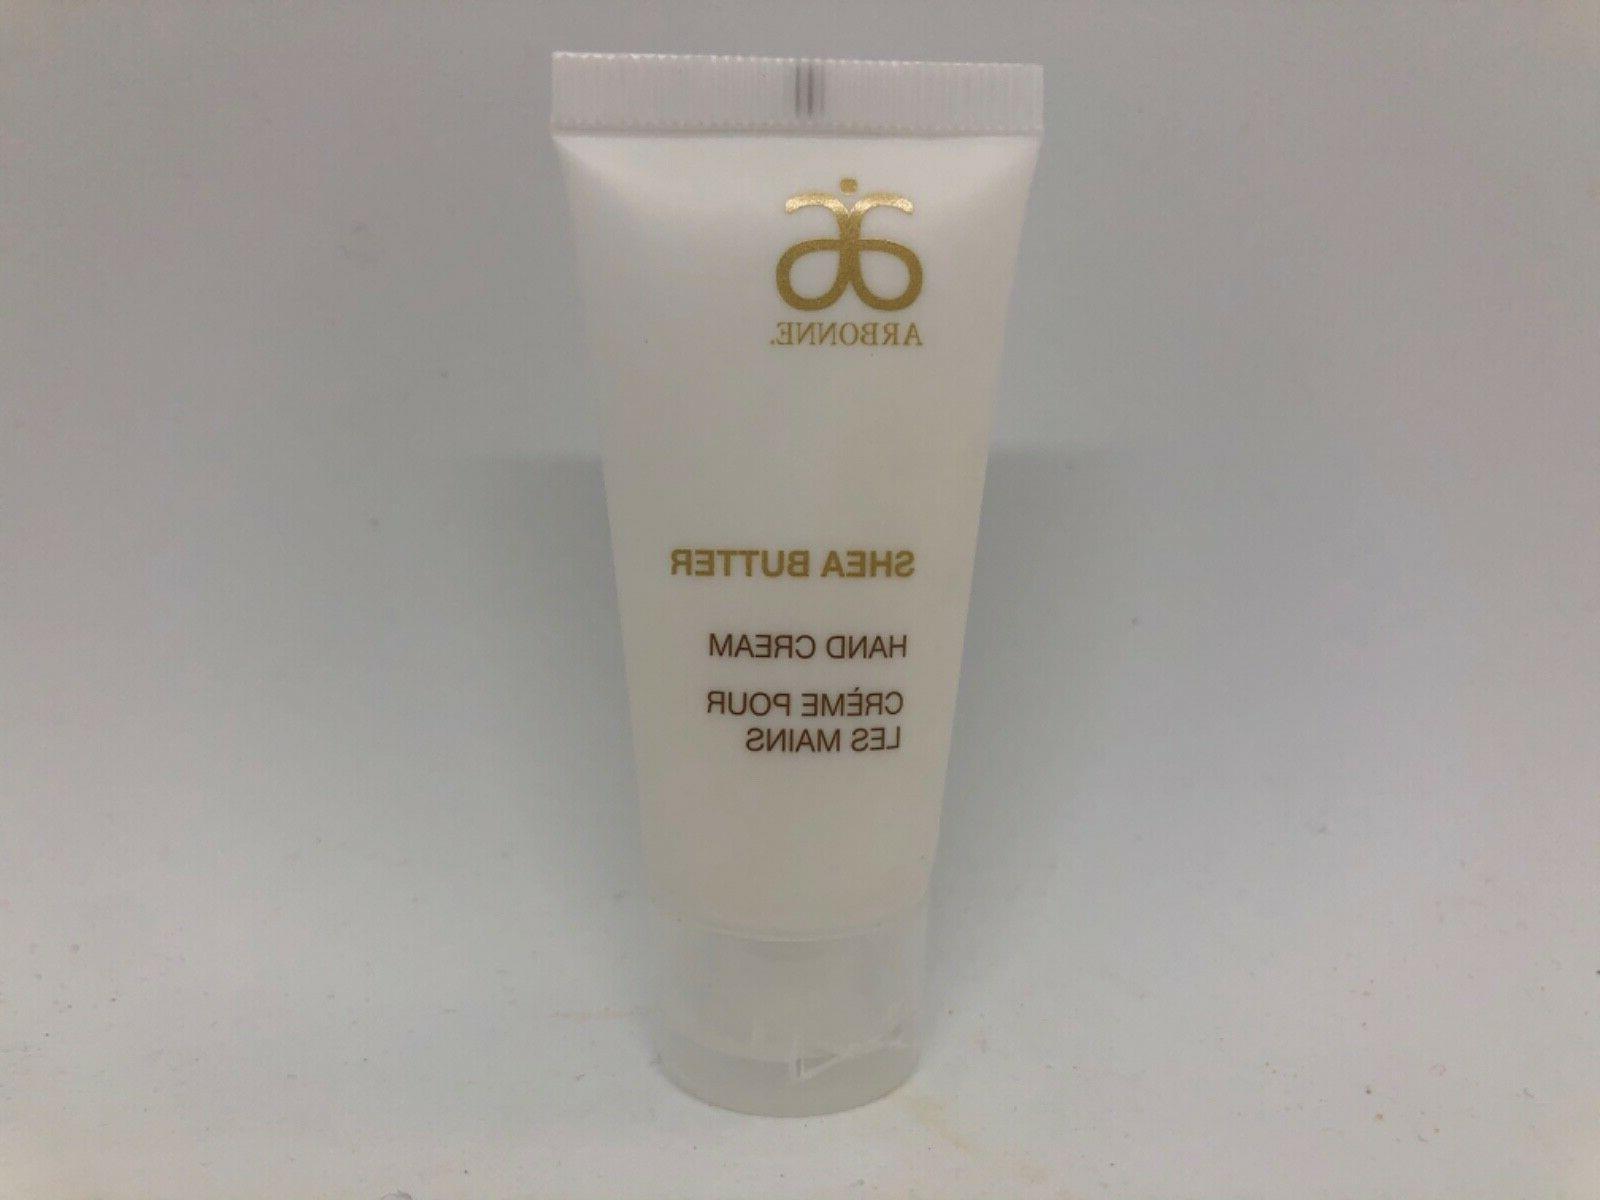 ARBONNE Shea Cream Sample 0.5